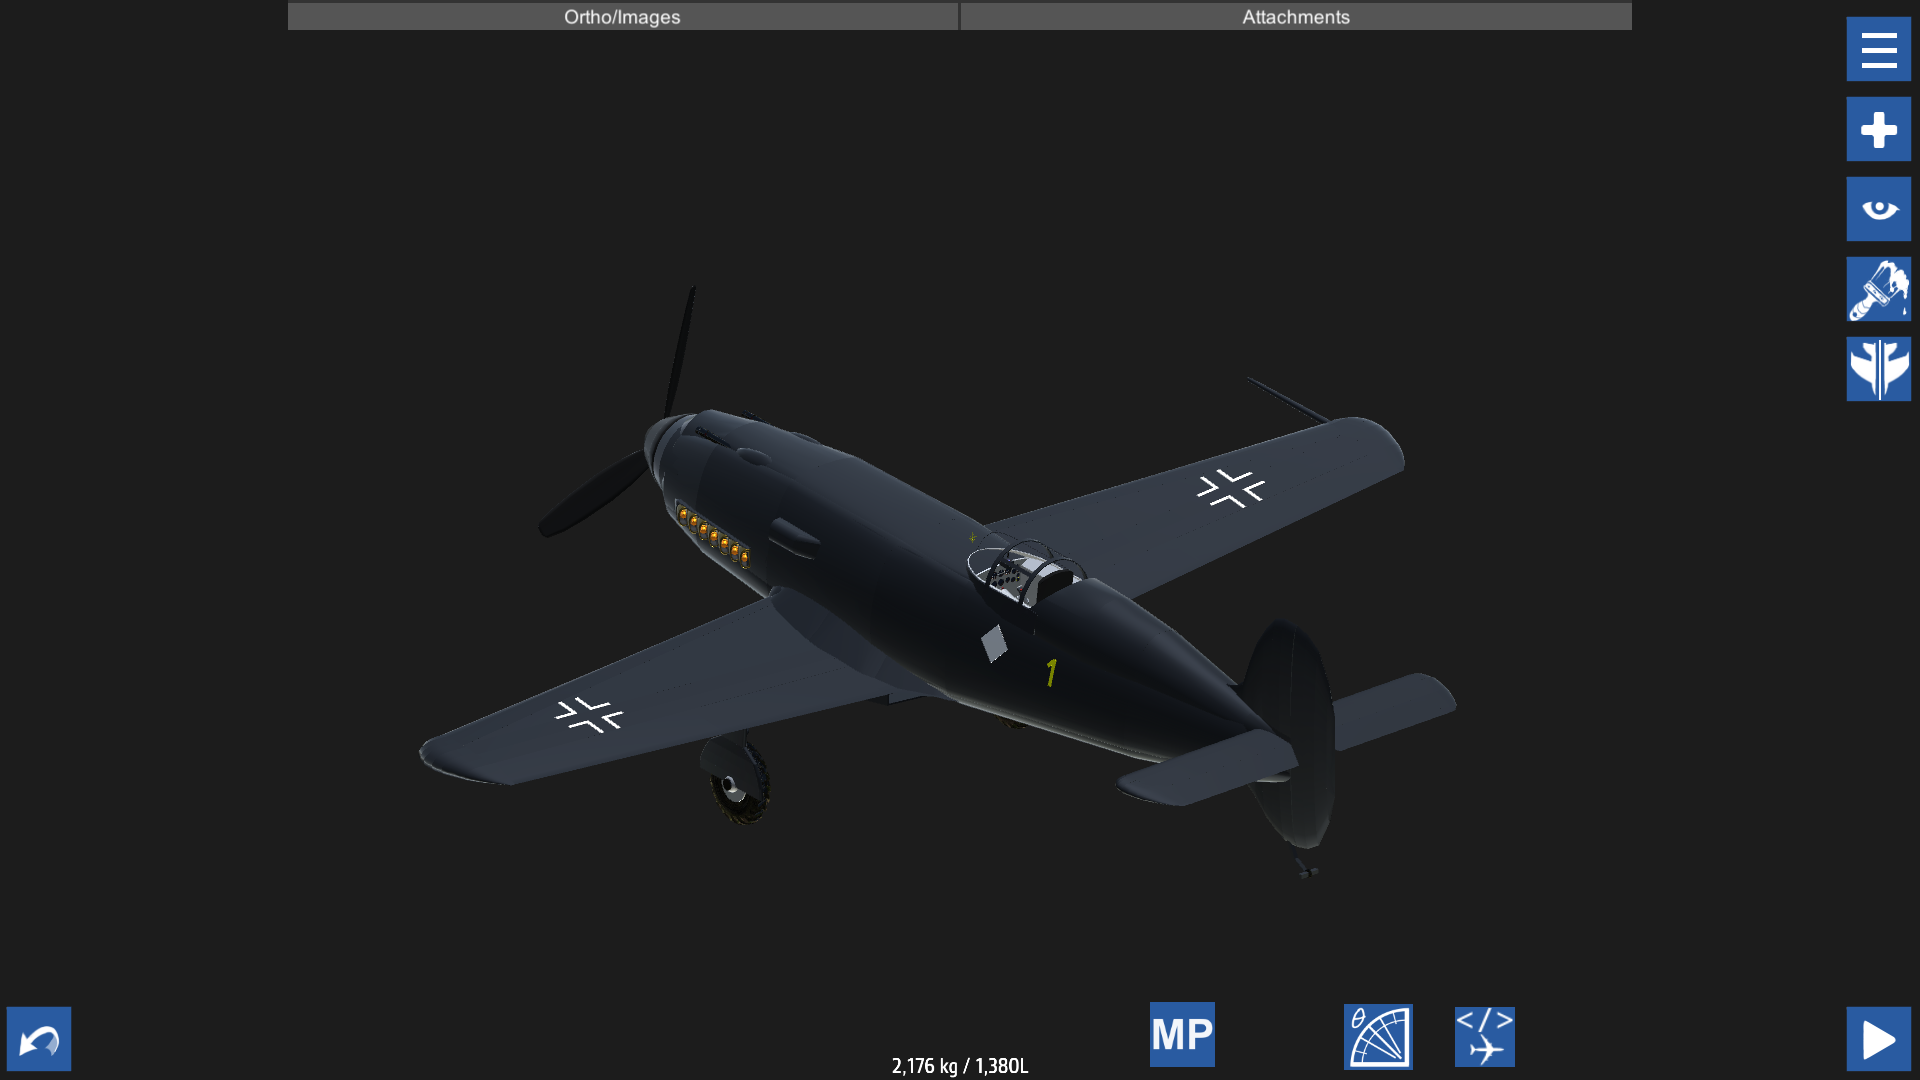 https://www.simpleplanes.com/a/dl76Ys/Beta-PE-Messerschmitt-Me-209-V4